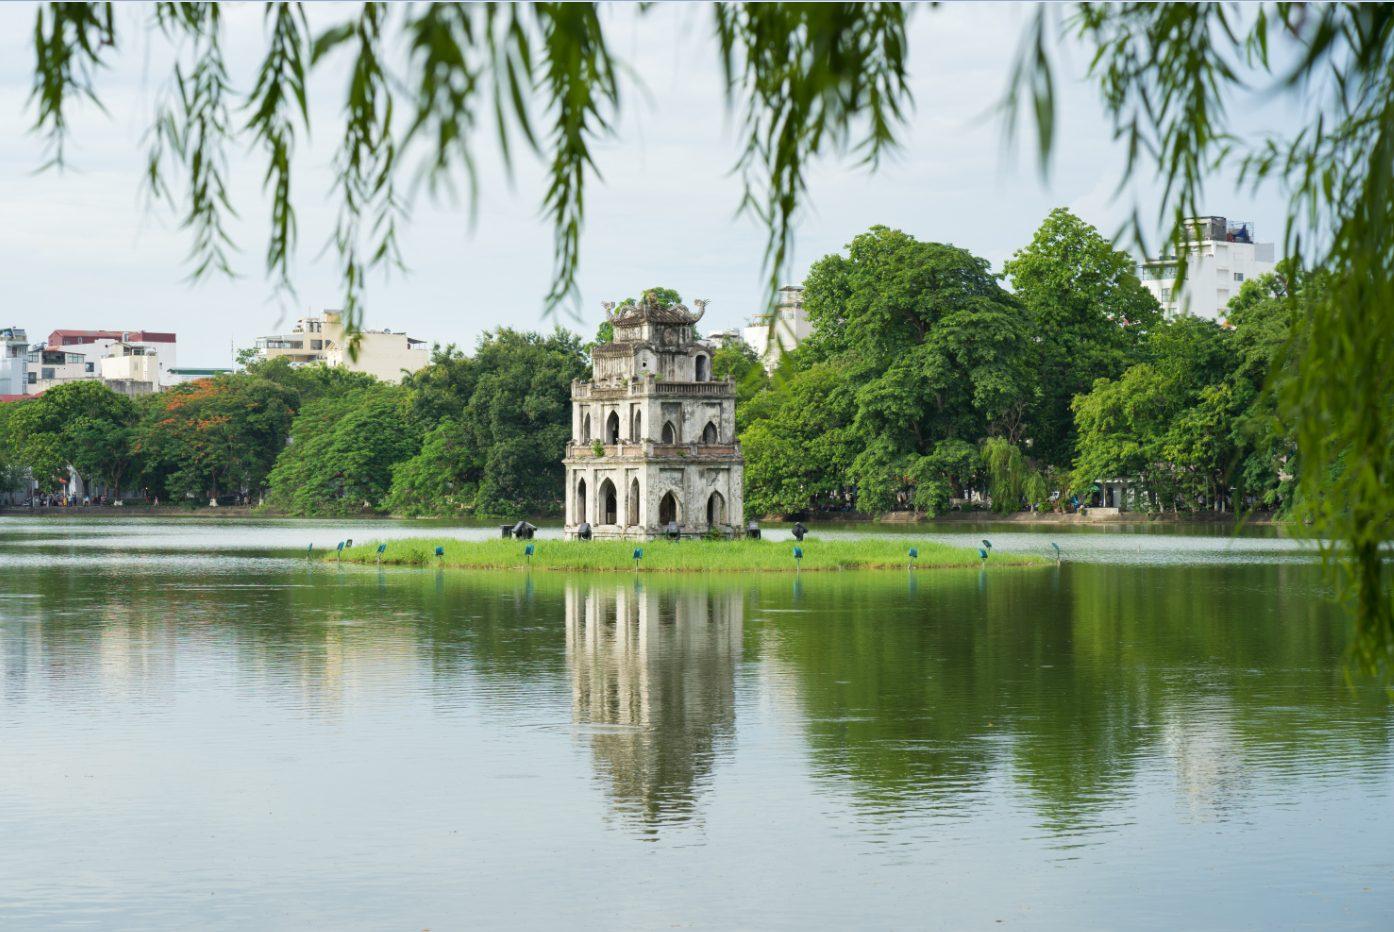 Tranh Phong Cảnh - 11503